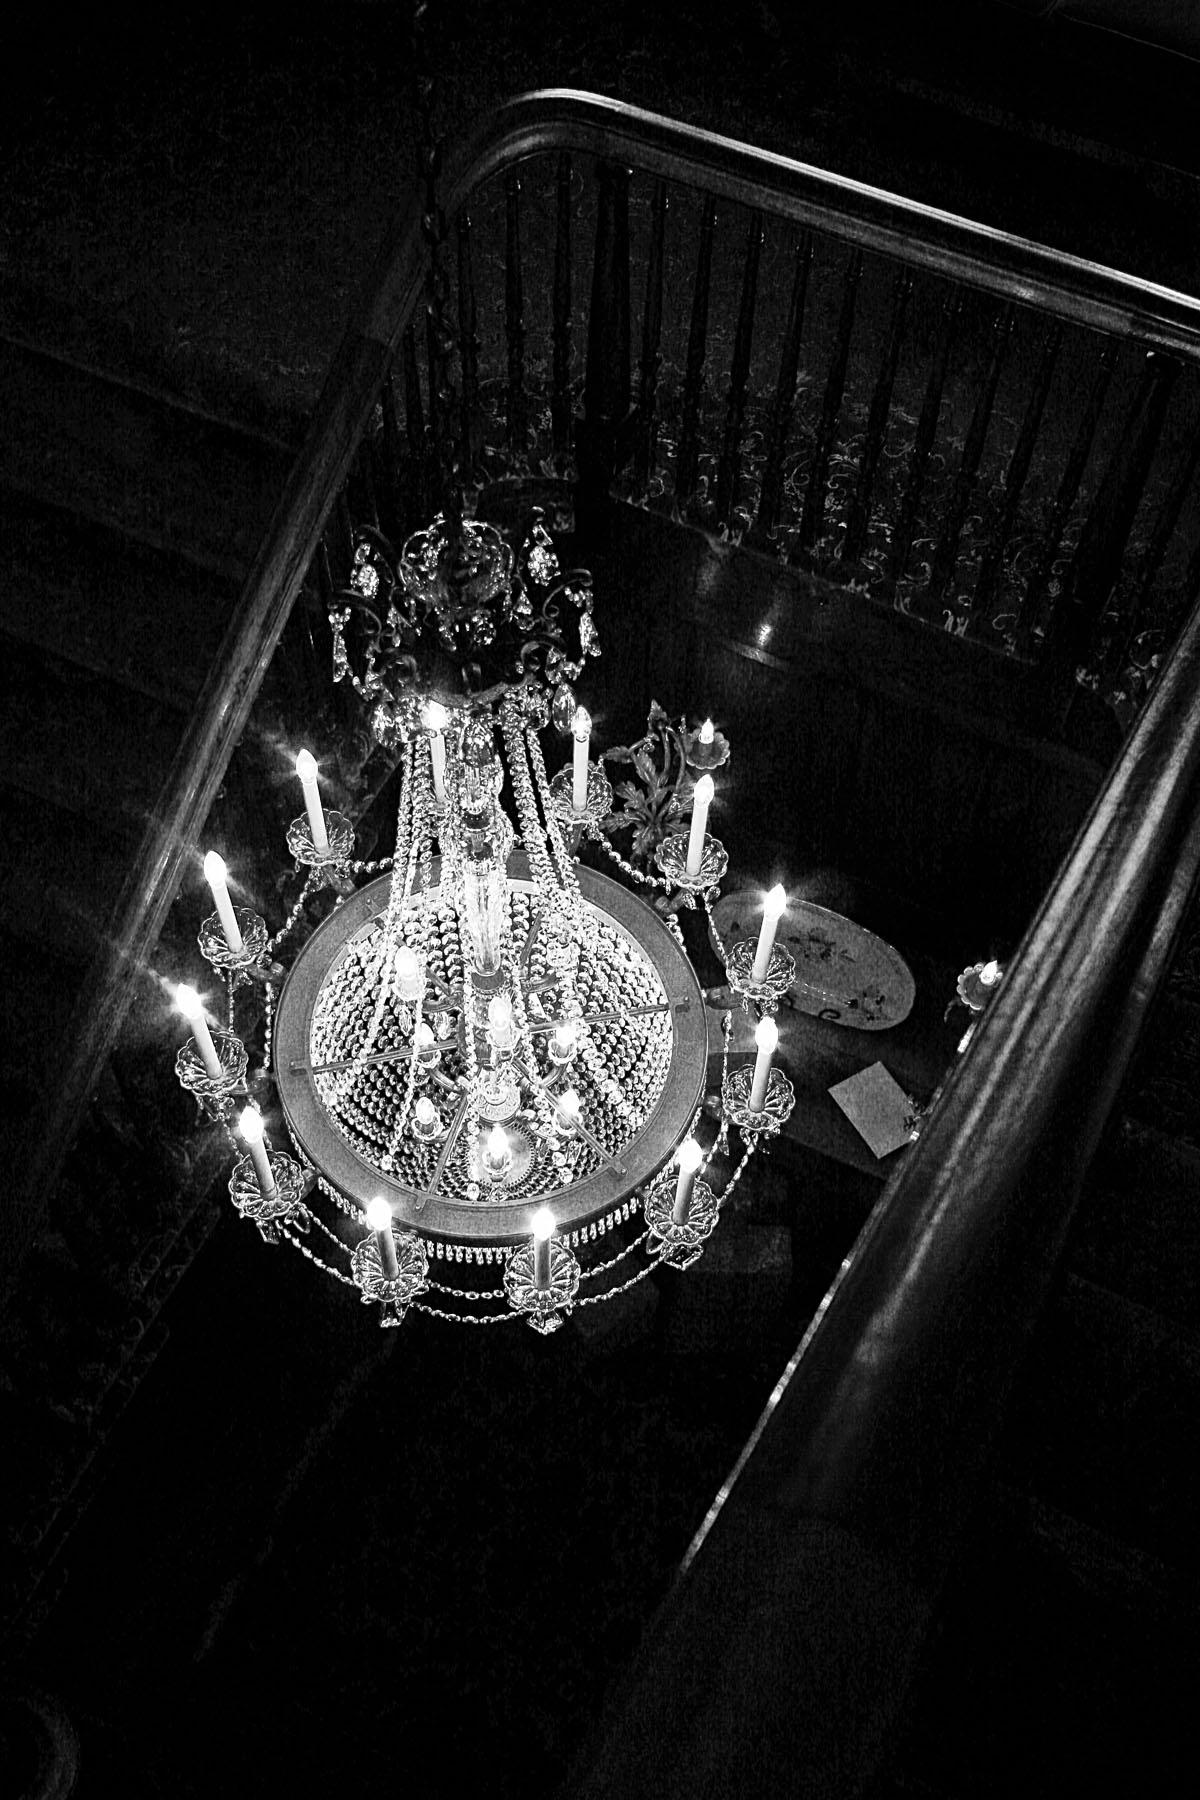 chandelier_bw_1.jpg